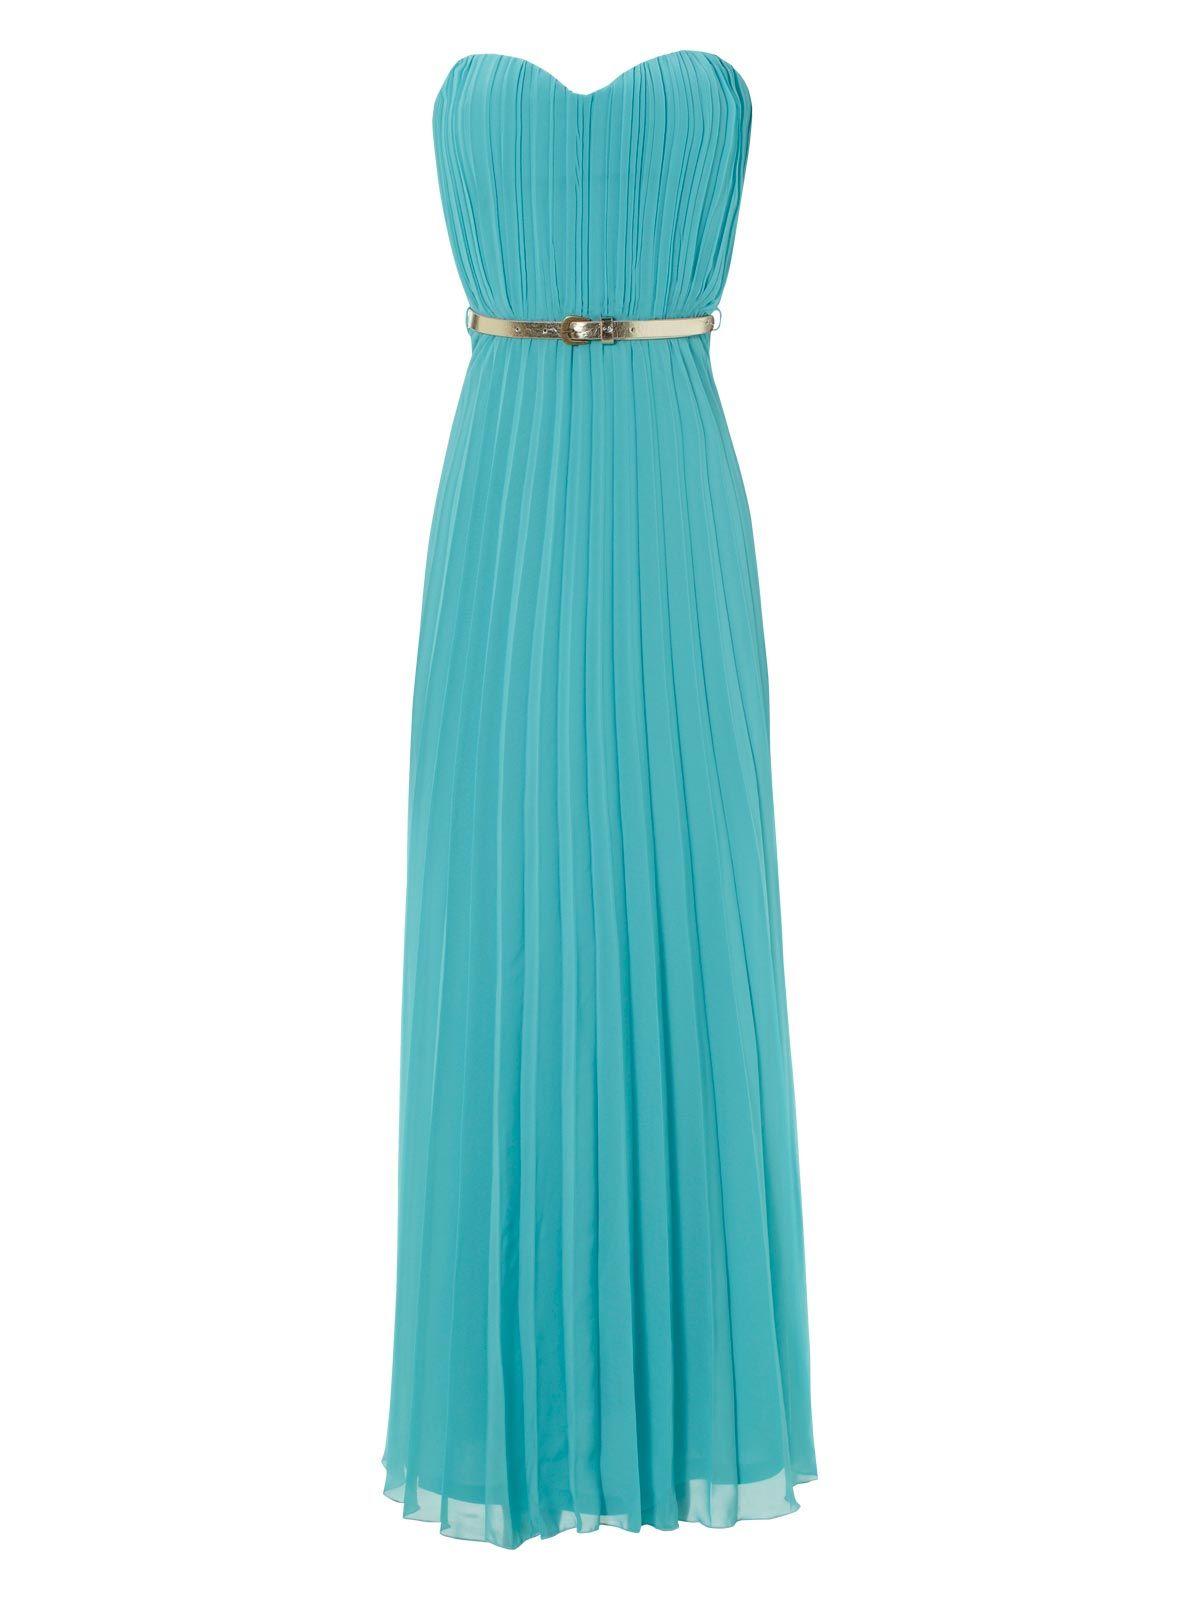 Turquoise Pleated Sweetheart Maxi Dress Turquoise Maxi Dress Pleated Dress Pattern Teal Bridesmaid Dresses [ 1600 x 1200 Pixel ]